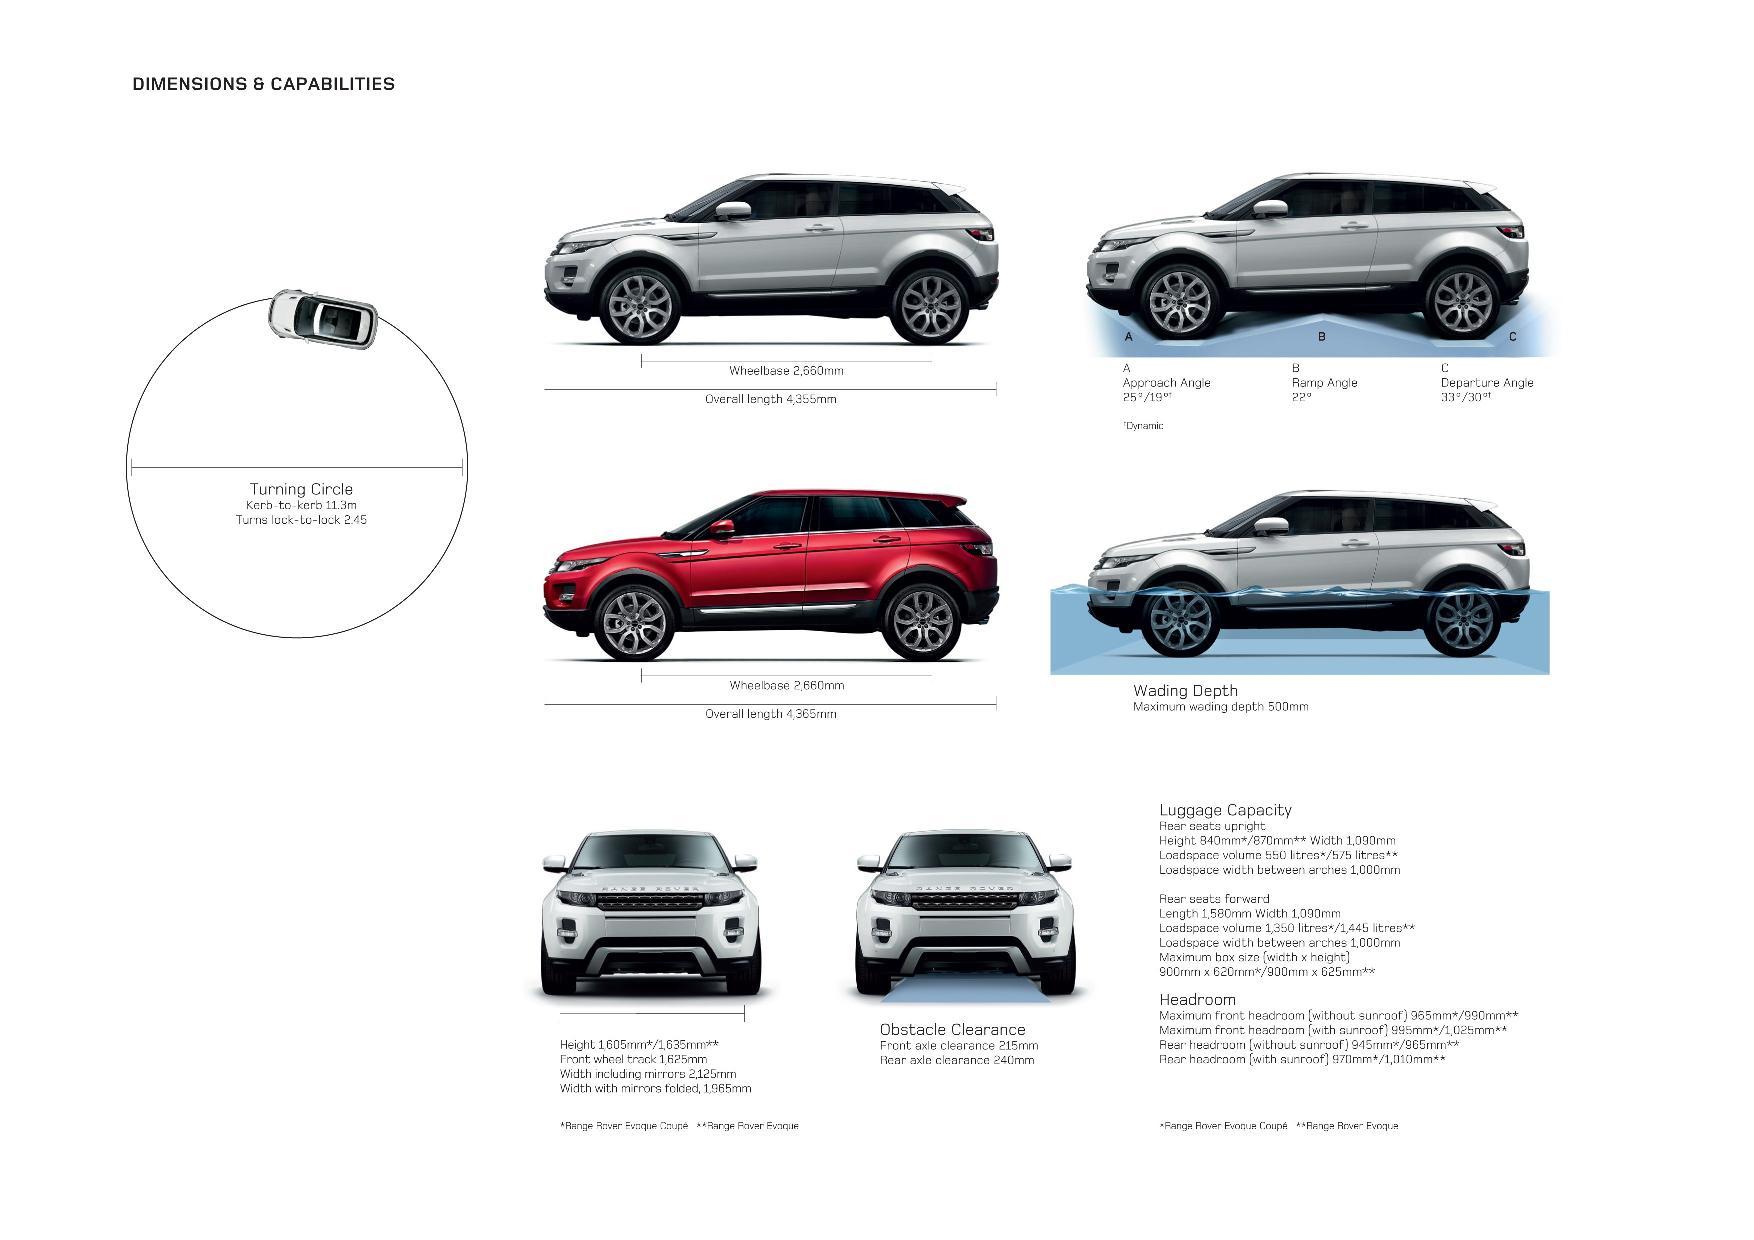 Land Rover Evoque Technical Specifications Range rover evoque